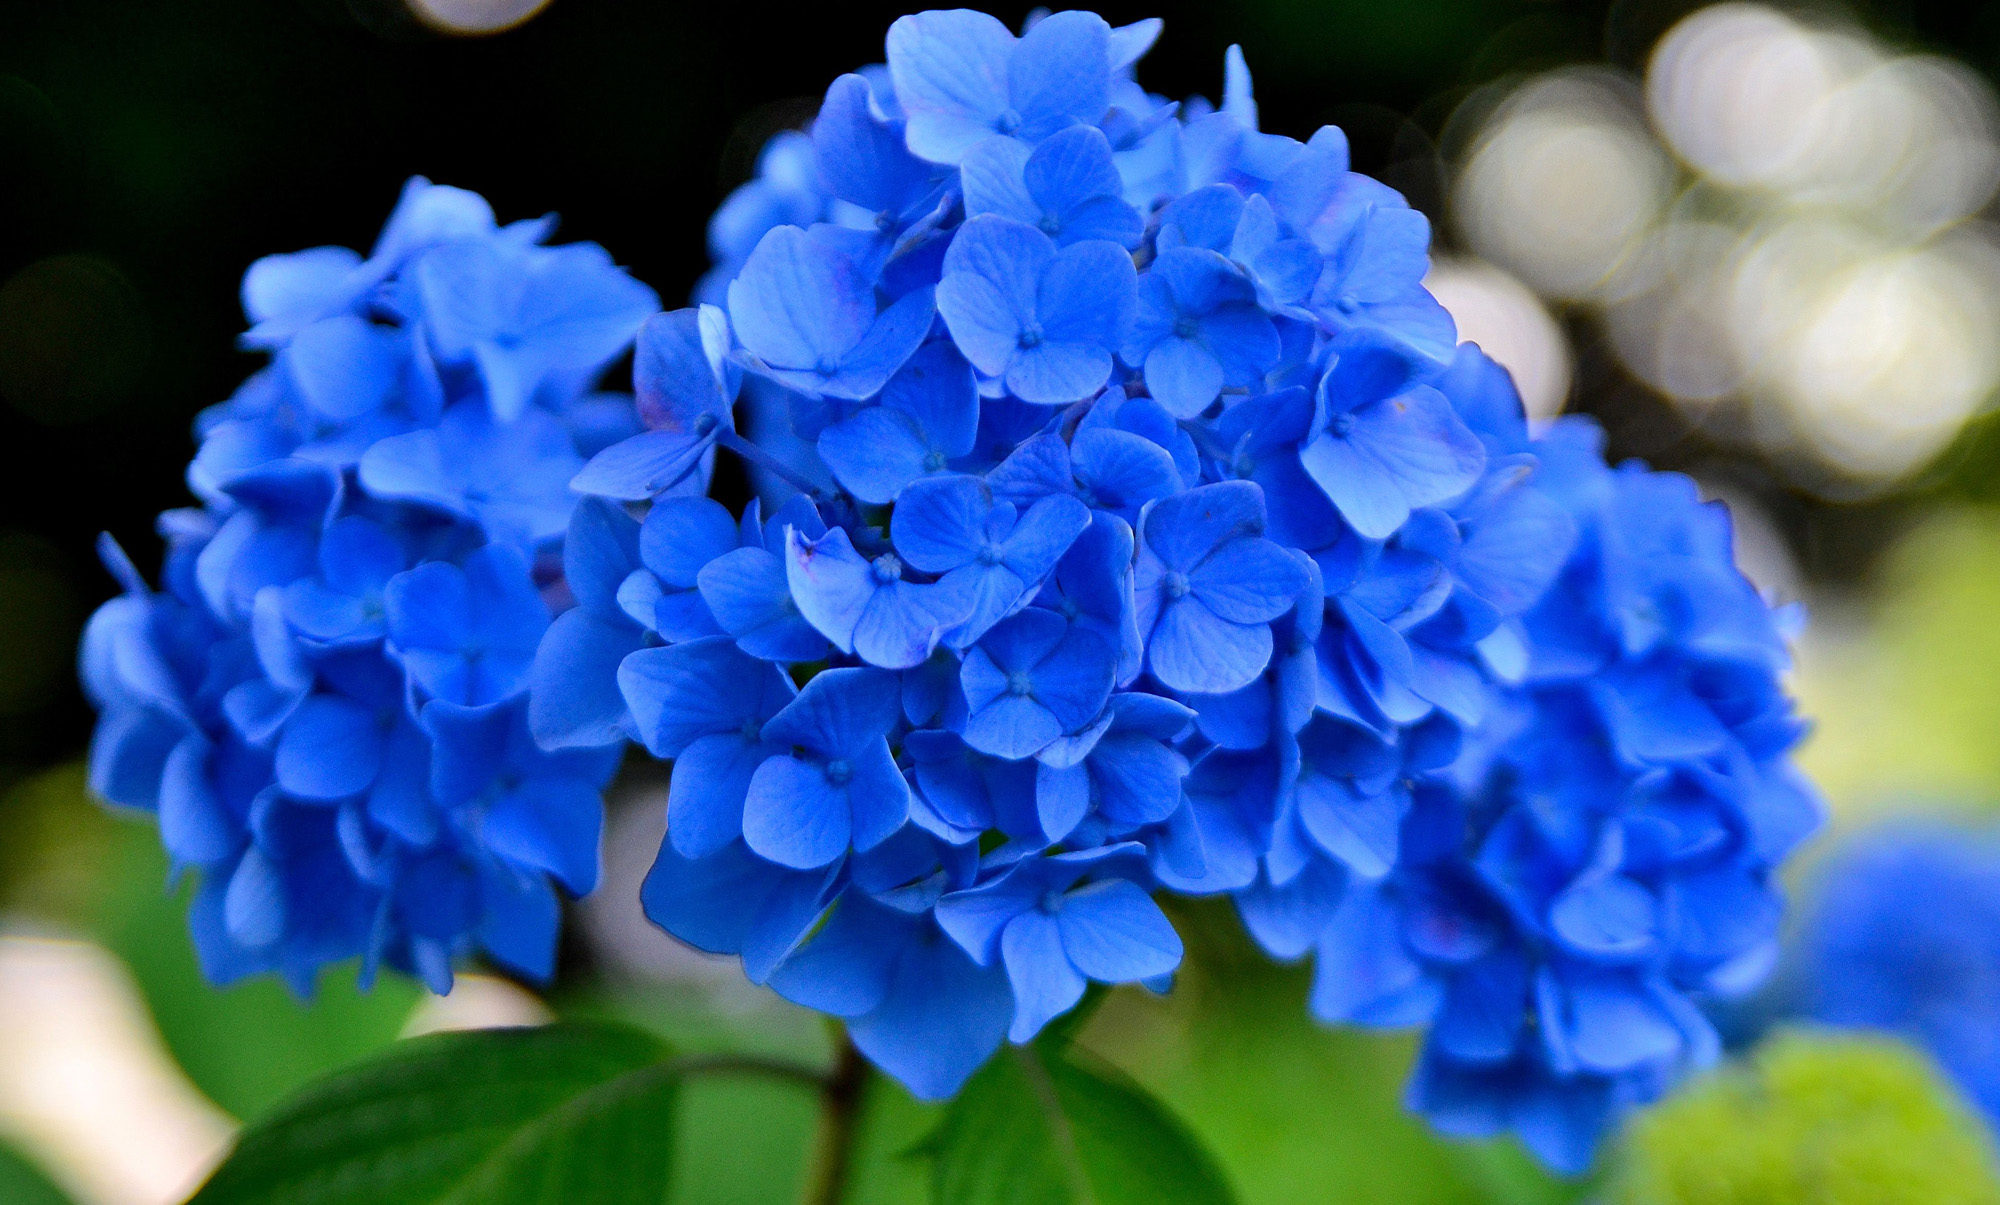 Фото цветов голубого цвета